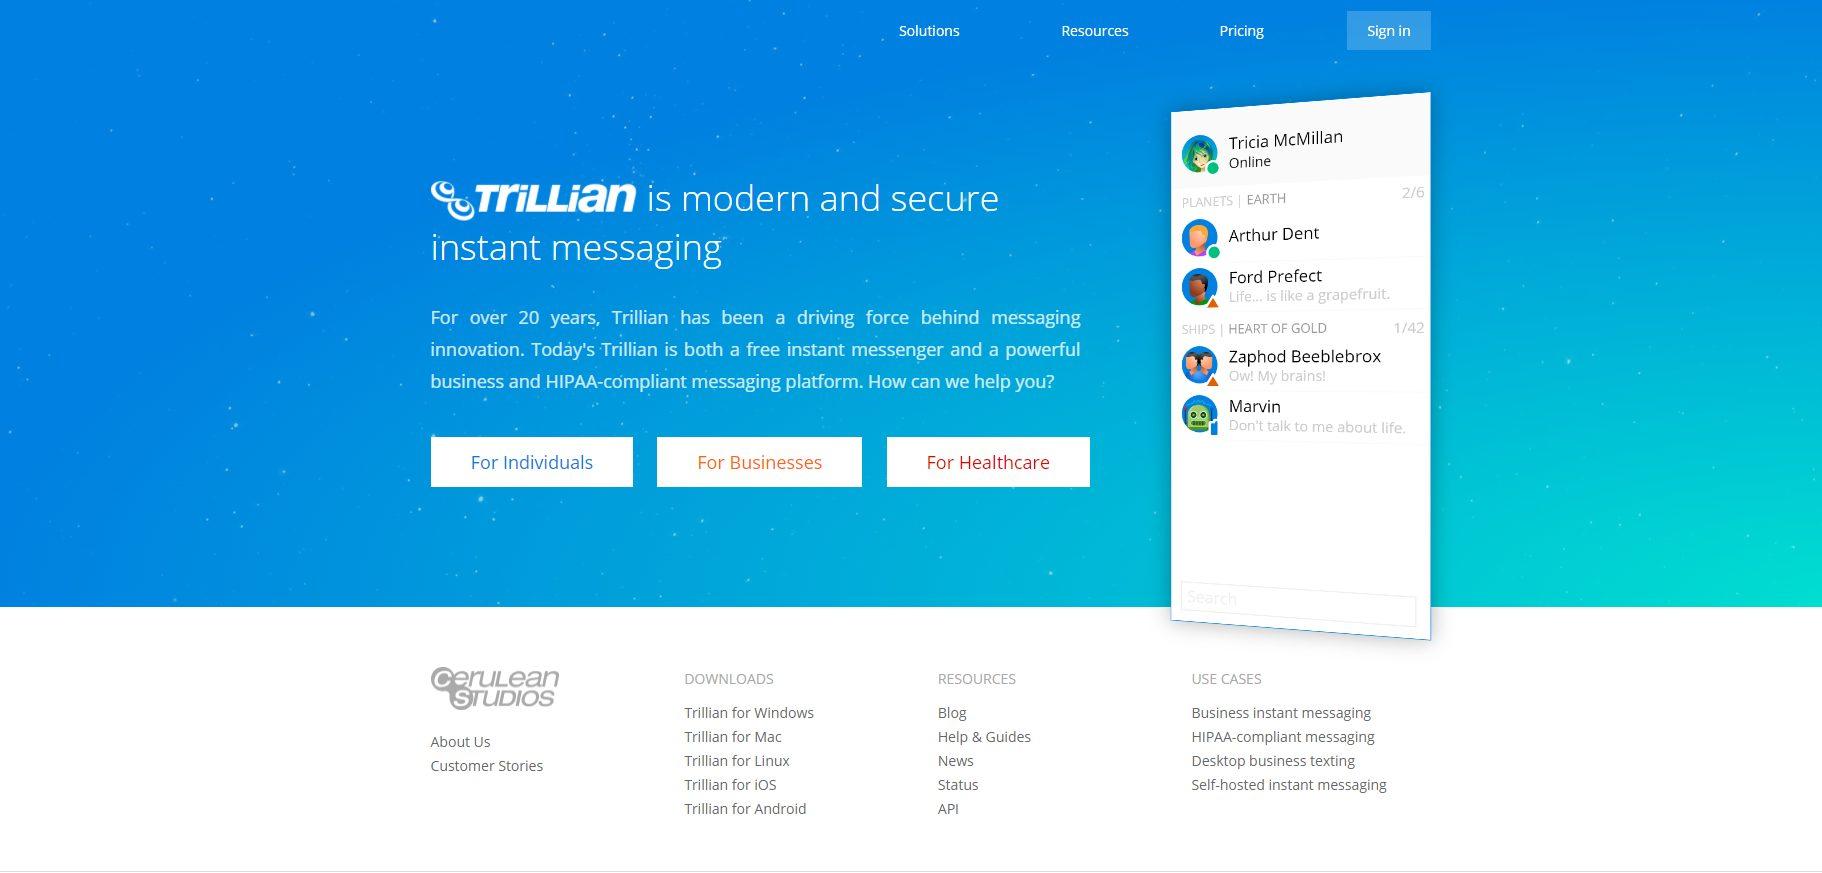 trillian- Apps Like Camfrog